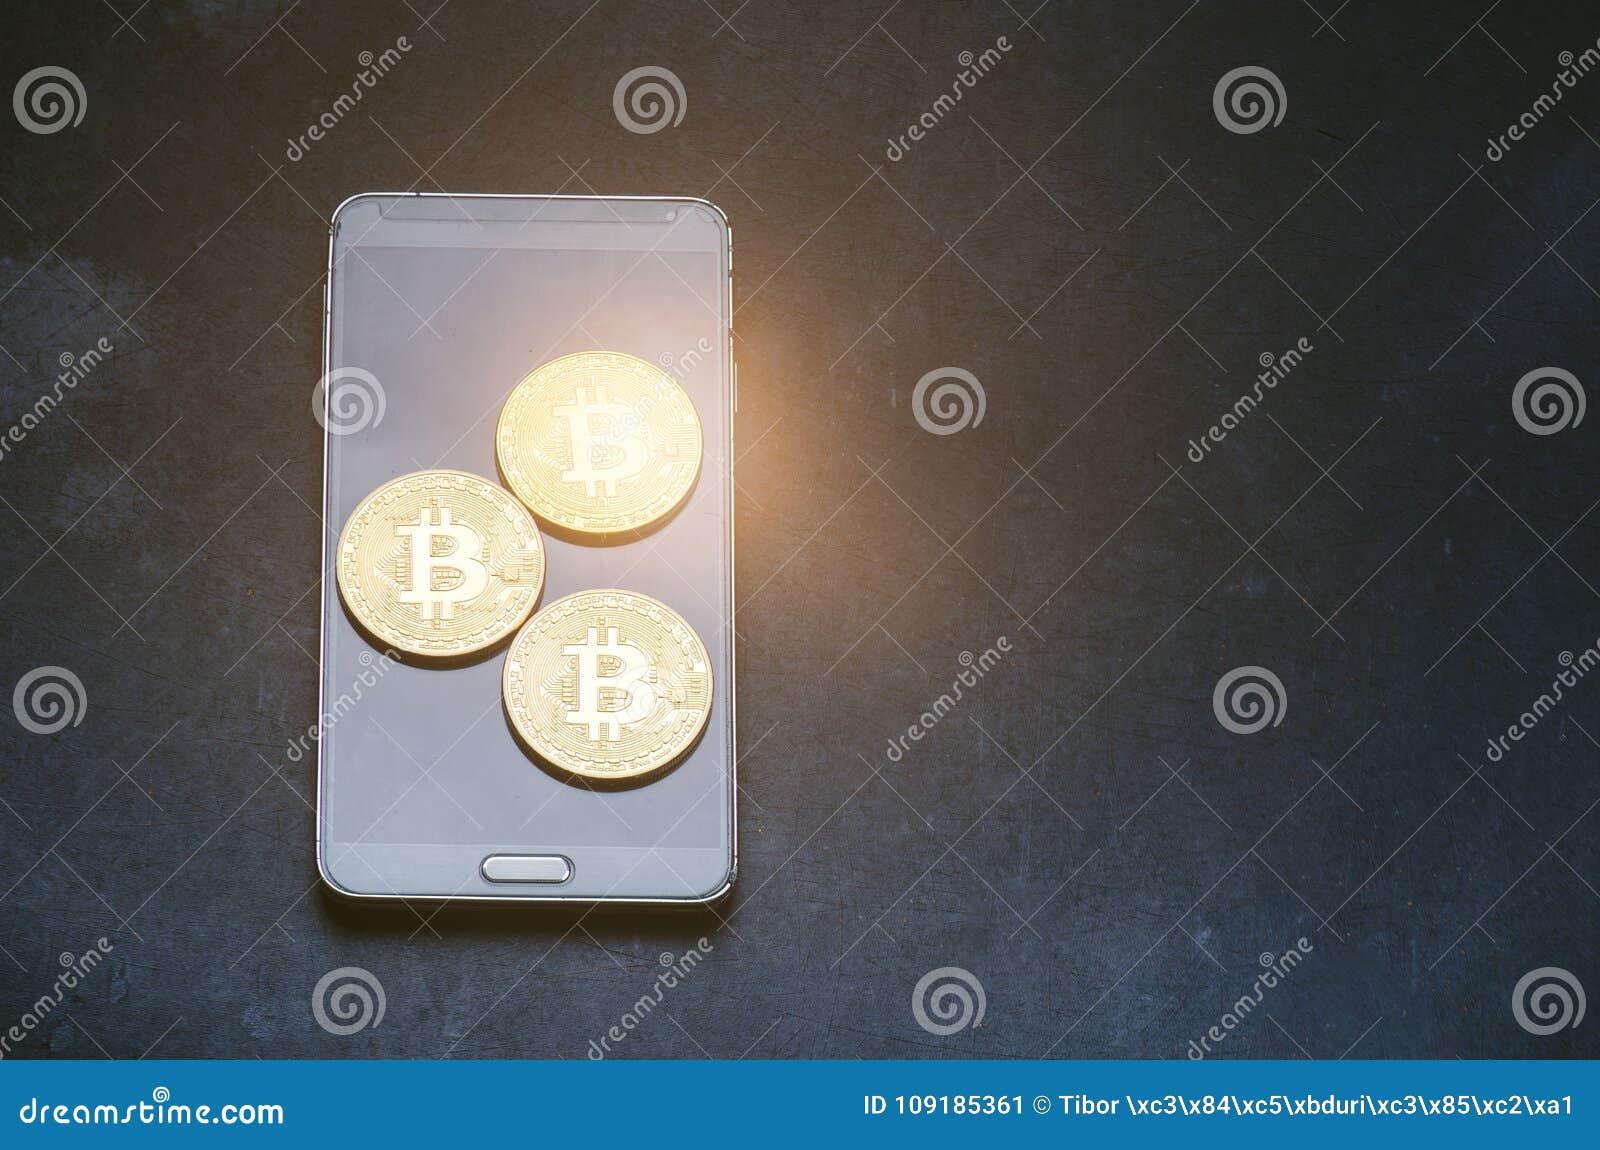 761fde9383 Χρυσά νομίσματα bitcoin σε ένα έξυπνο τηλέφωνο Εικονικό νόμισμα Crypto  νόμισμα Νέα εικονική φλόγα φακών χρημάτων